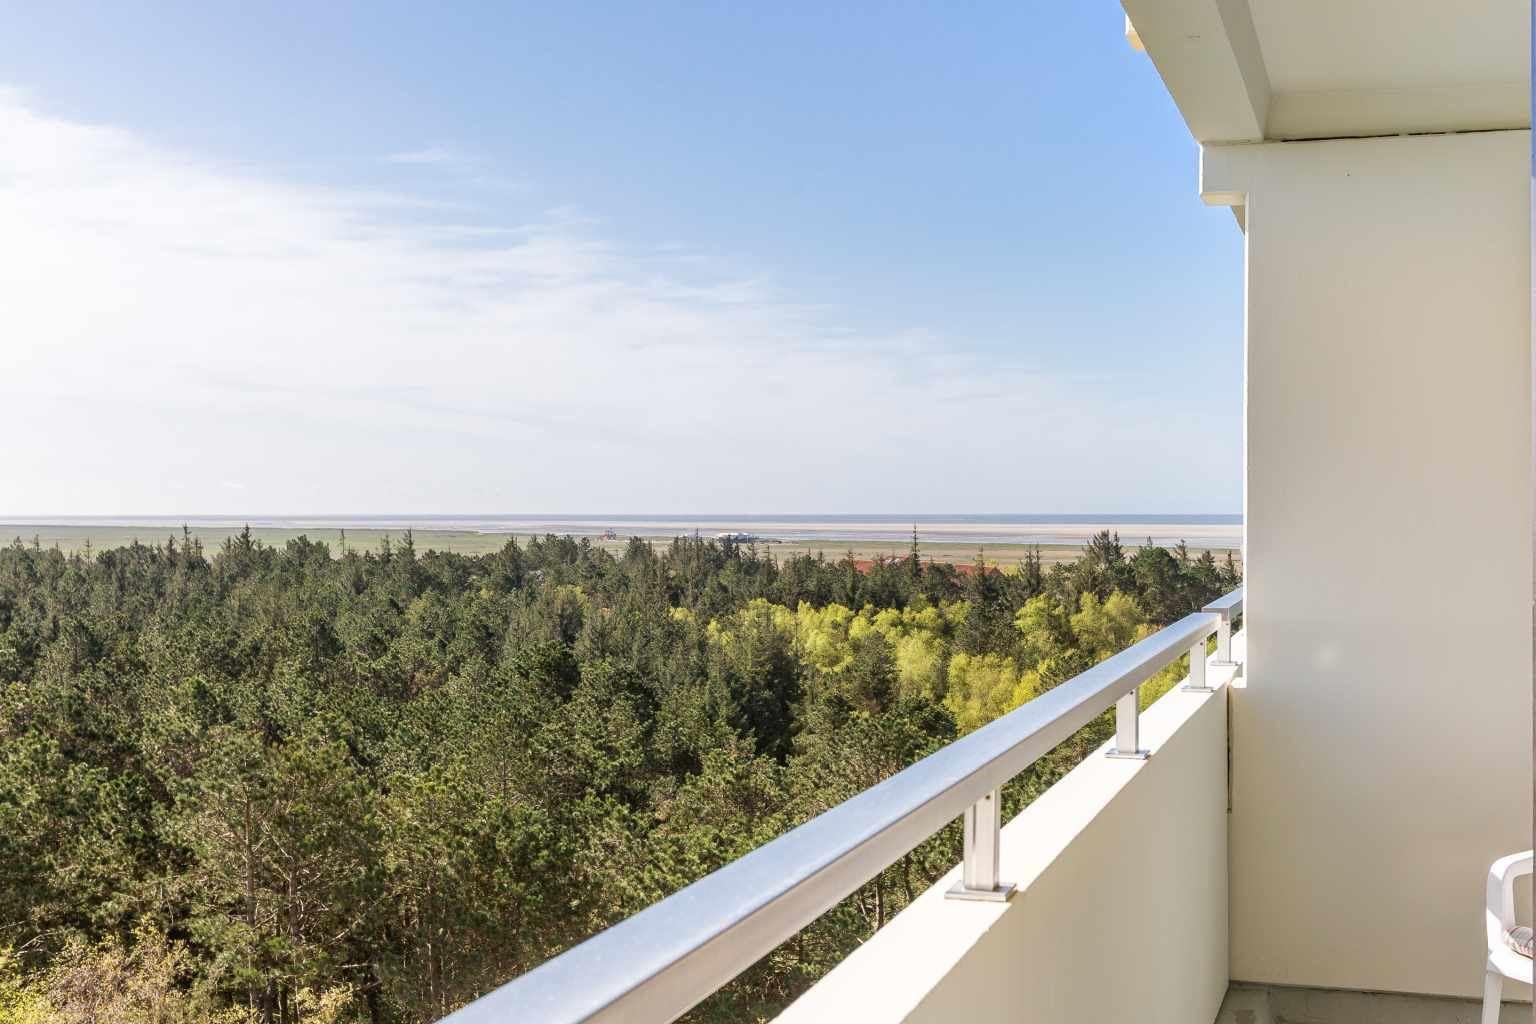 Balkon mit Meerblick - St Peter Ording Bad, Haus Atlantic, Wohnung 148